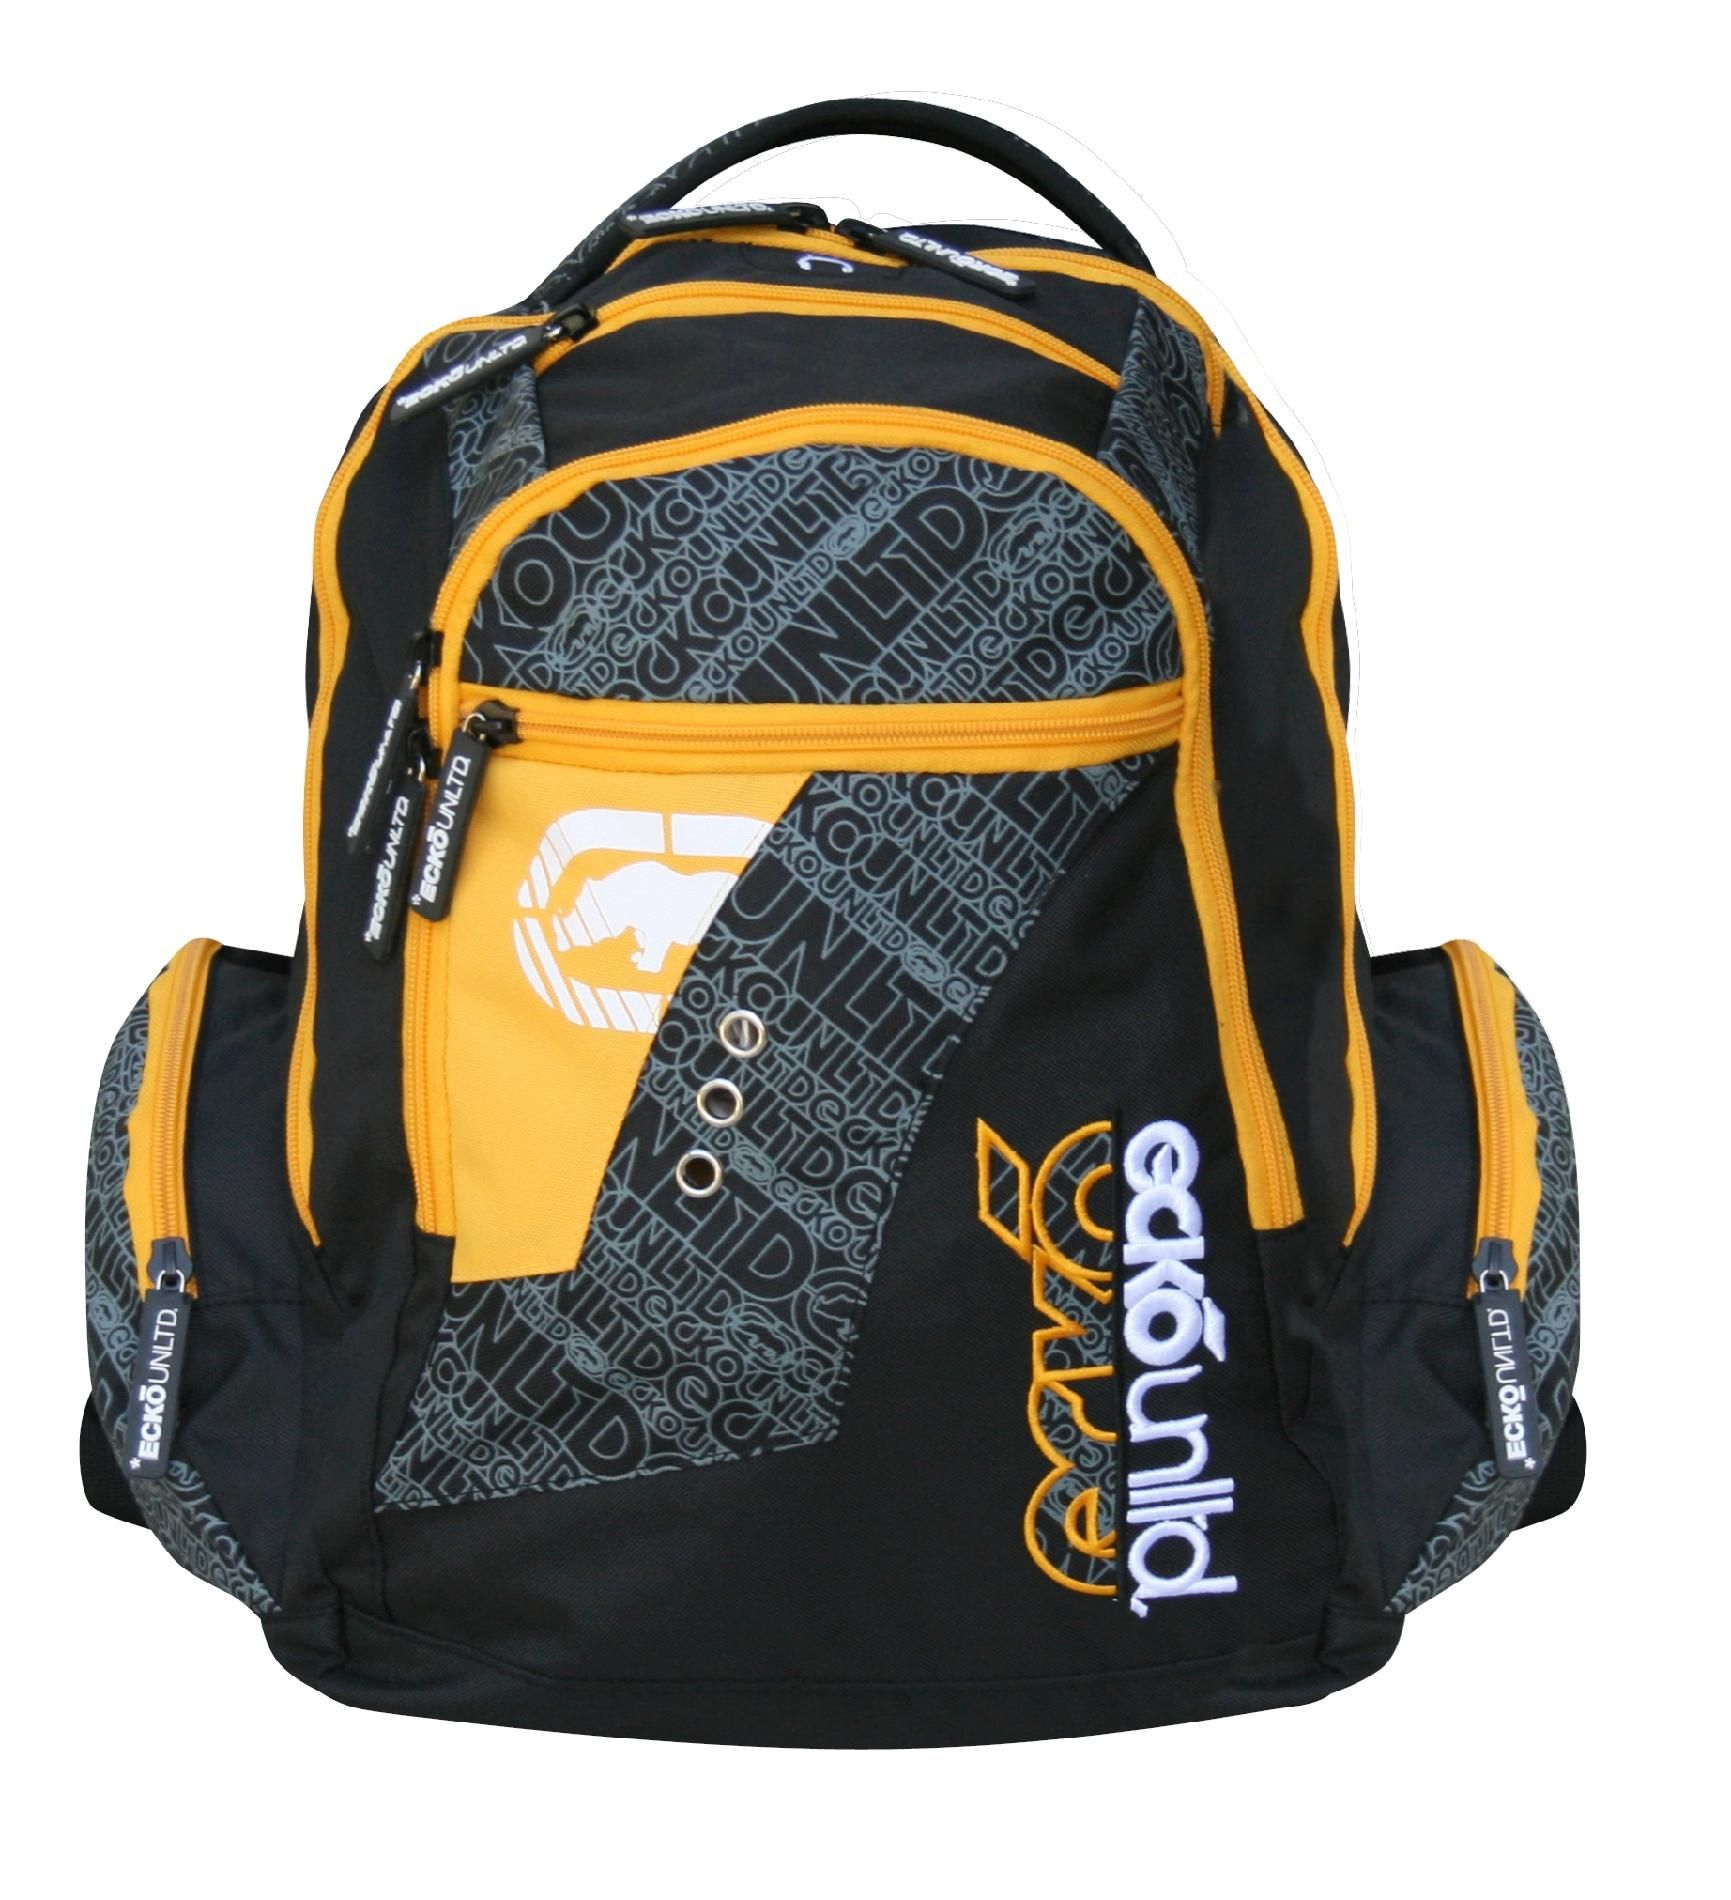 Black/Yellow Backpack Ecko751-071